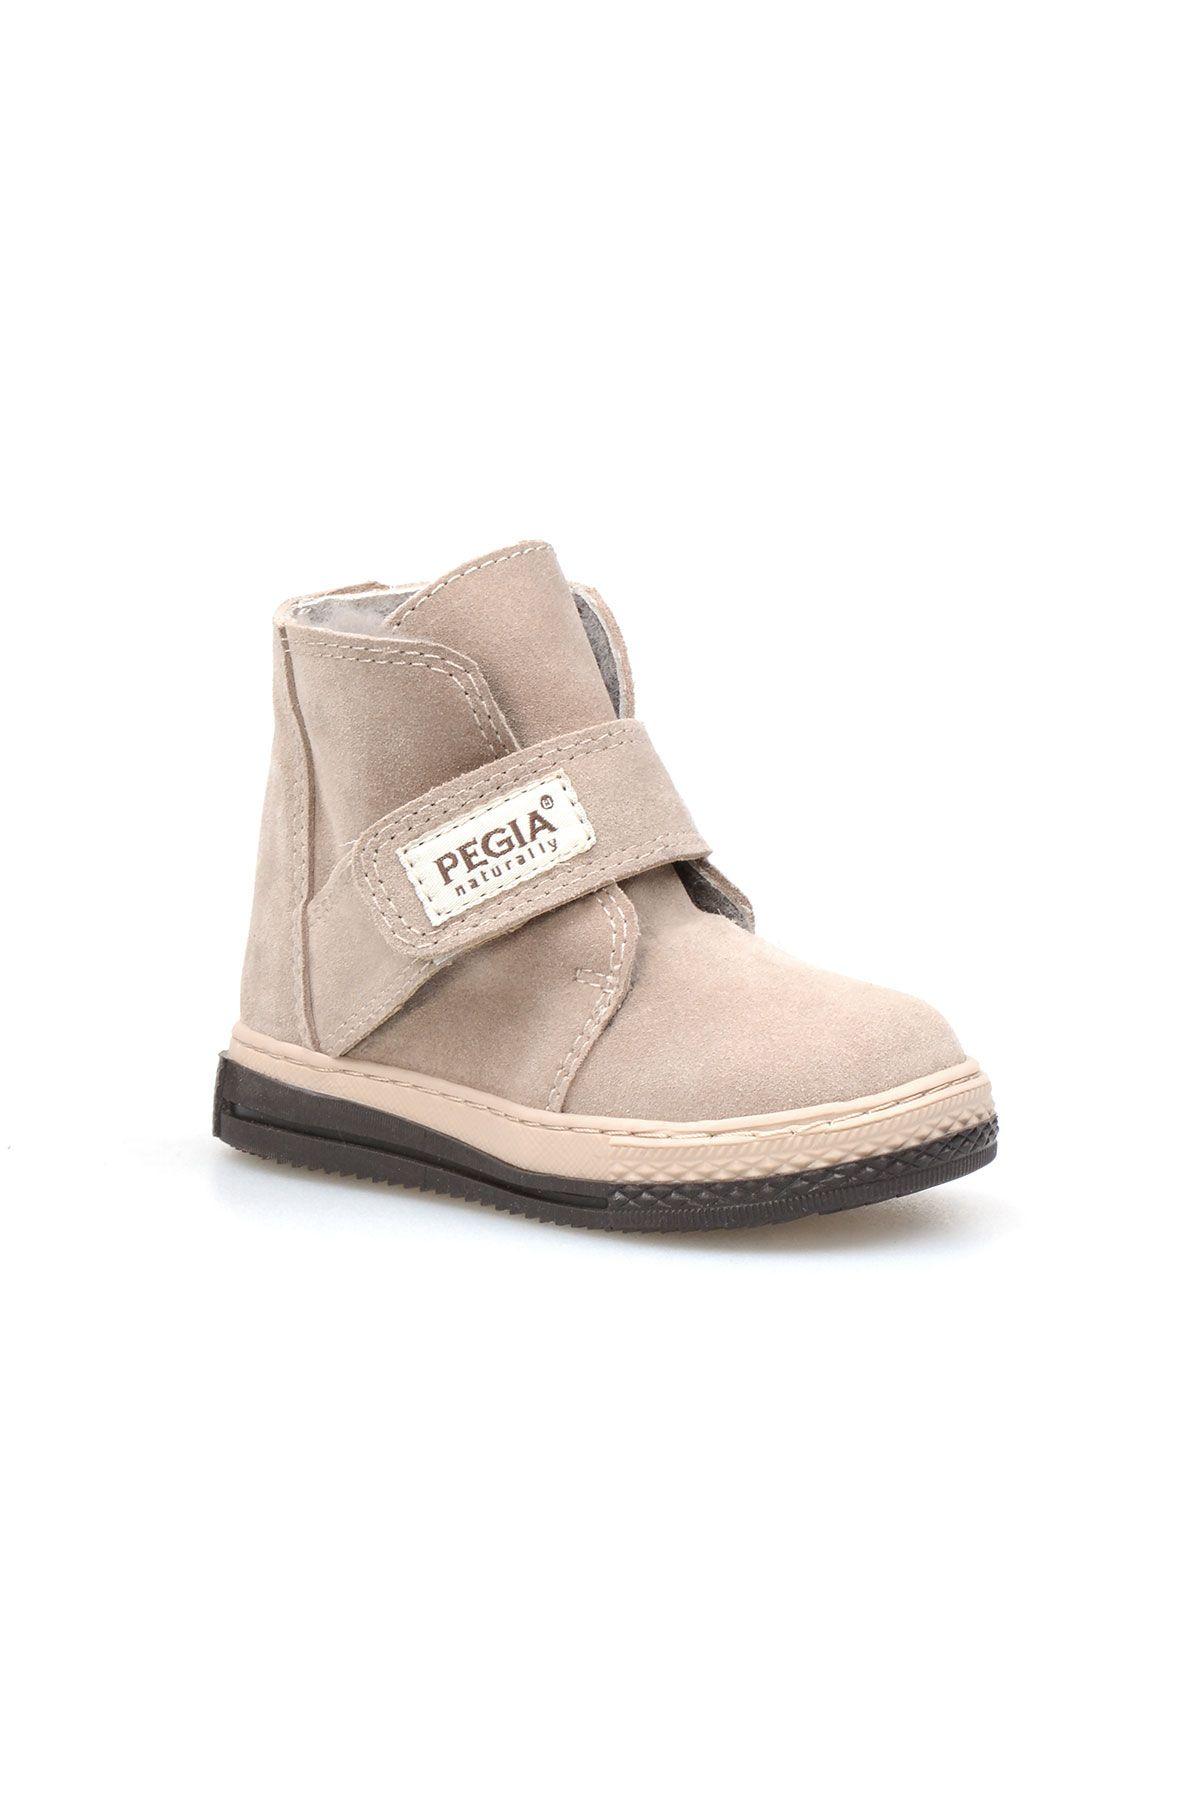 Pegia Genuine Suede Sheepskin Lined Kid's Boots 186019 Beige